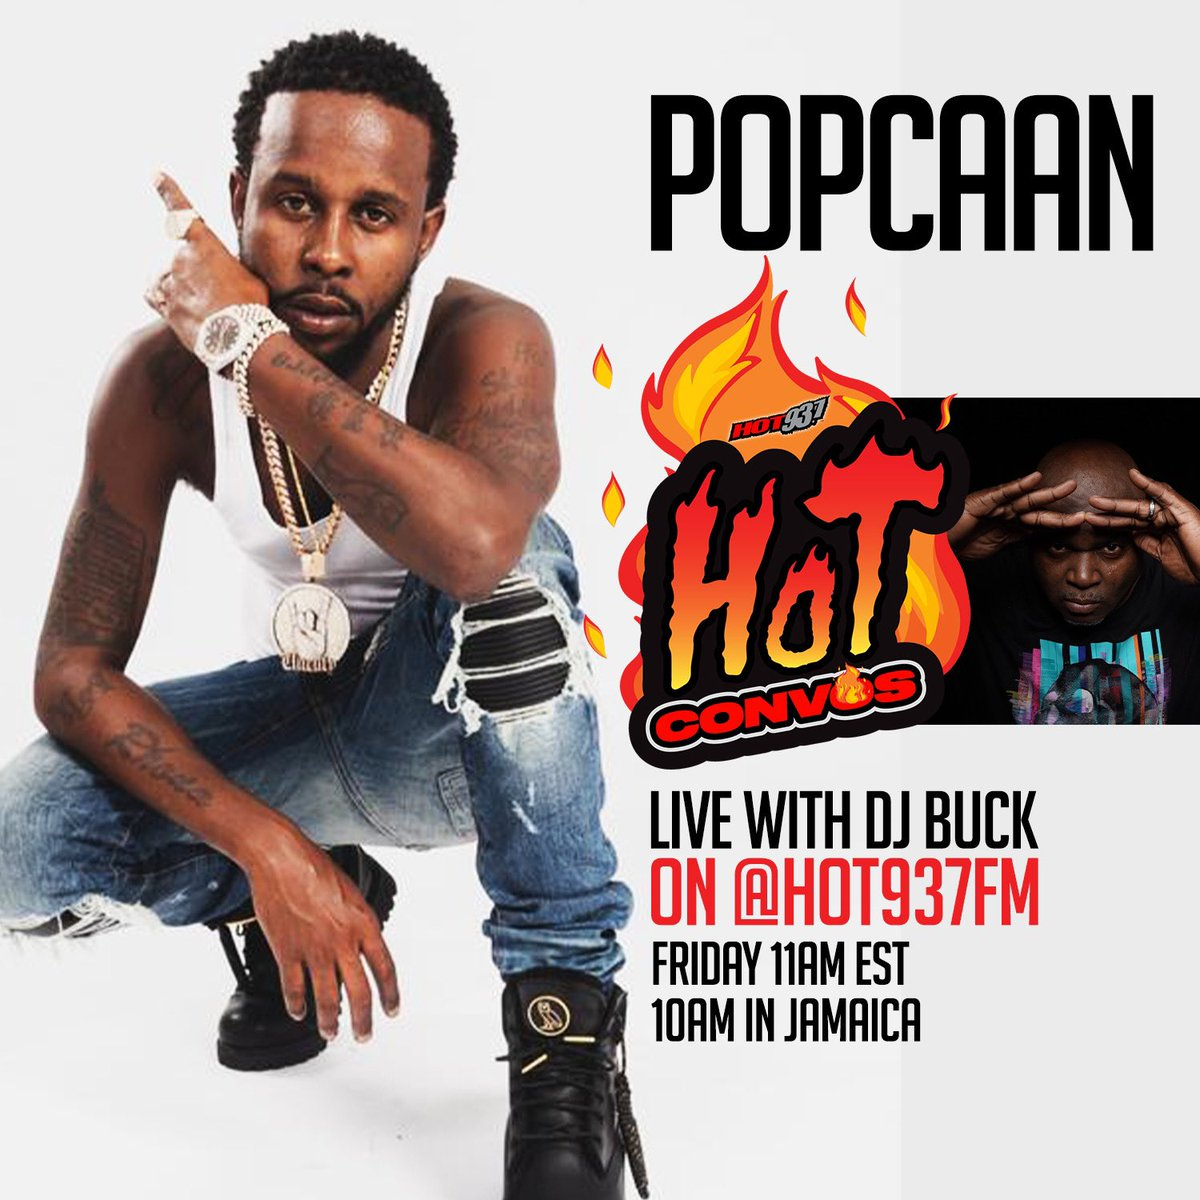 Today is an #Unruly Friday!  #Hot937HotConvos With @djbuck1 & @PopcaanMusic 🔥. 🇺🇸: 11am EST. 🇯🇲: 10am In Jamaica. #Fixtape #Ovo #ReggaeRideToWork